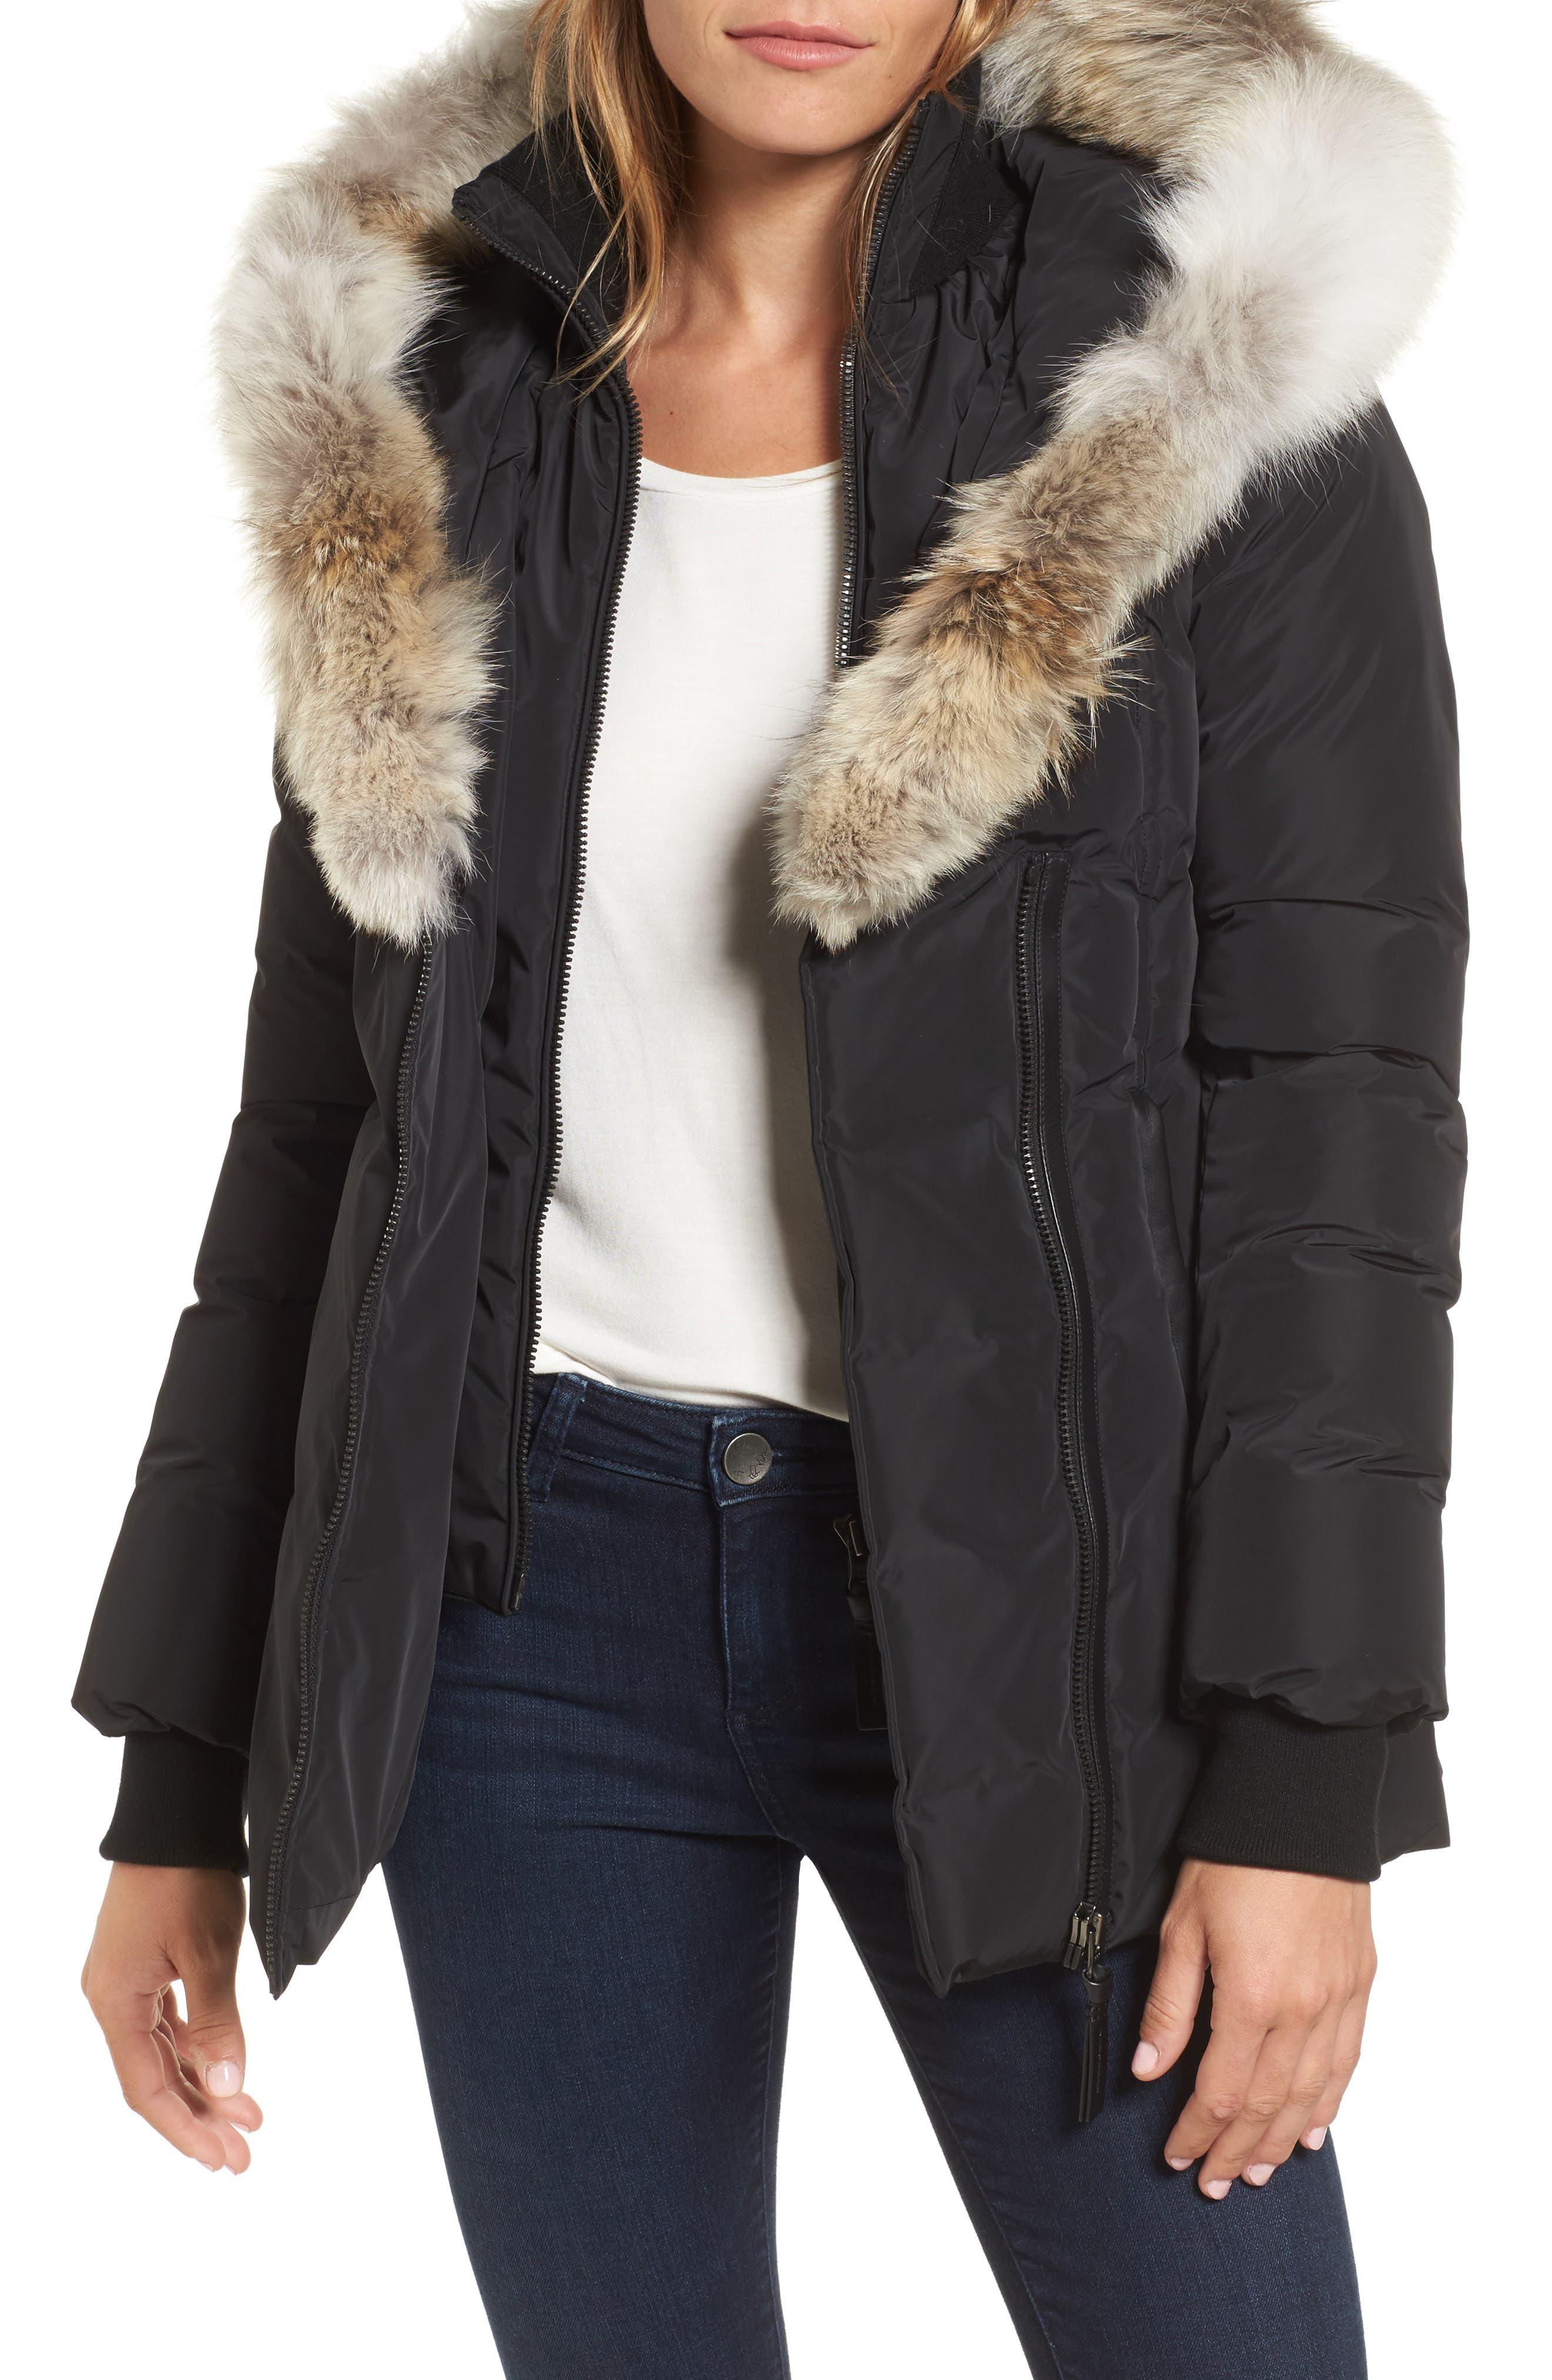 MACKAGE Hooded Down Parka with Inset Bib & Genuine Fox Fur Trim, Main, color, 001